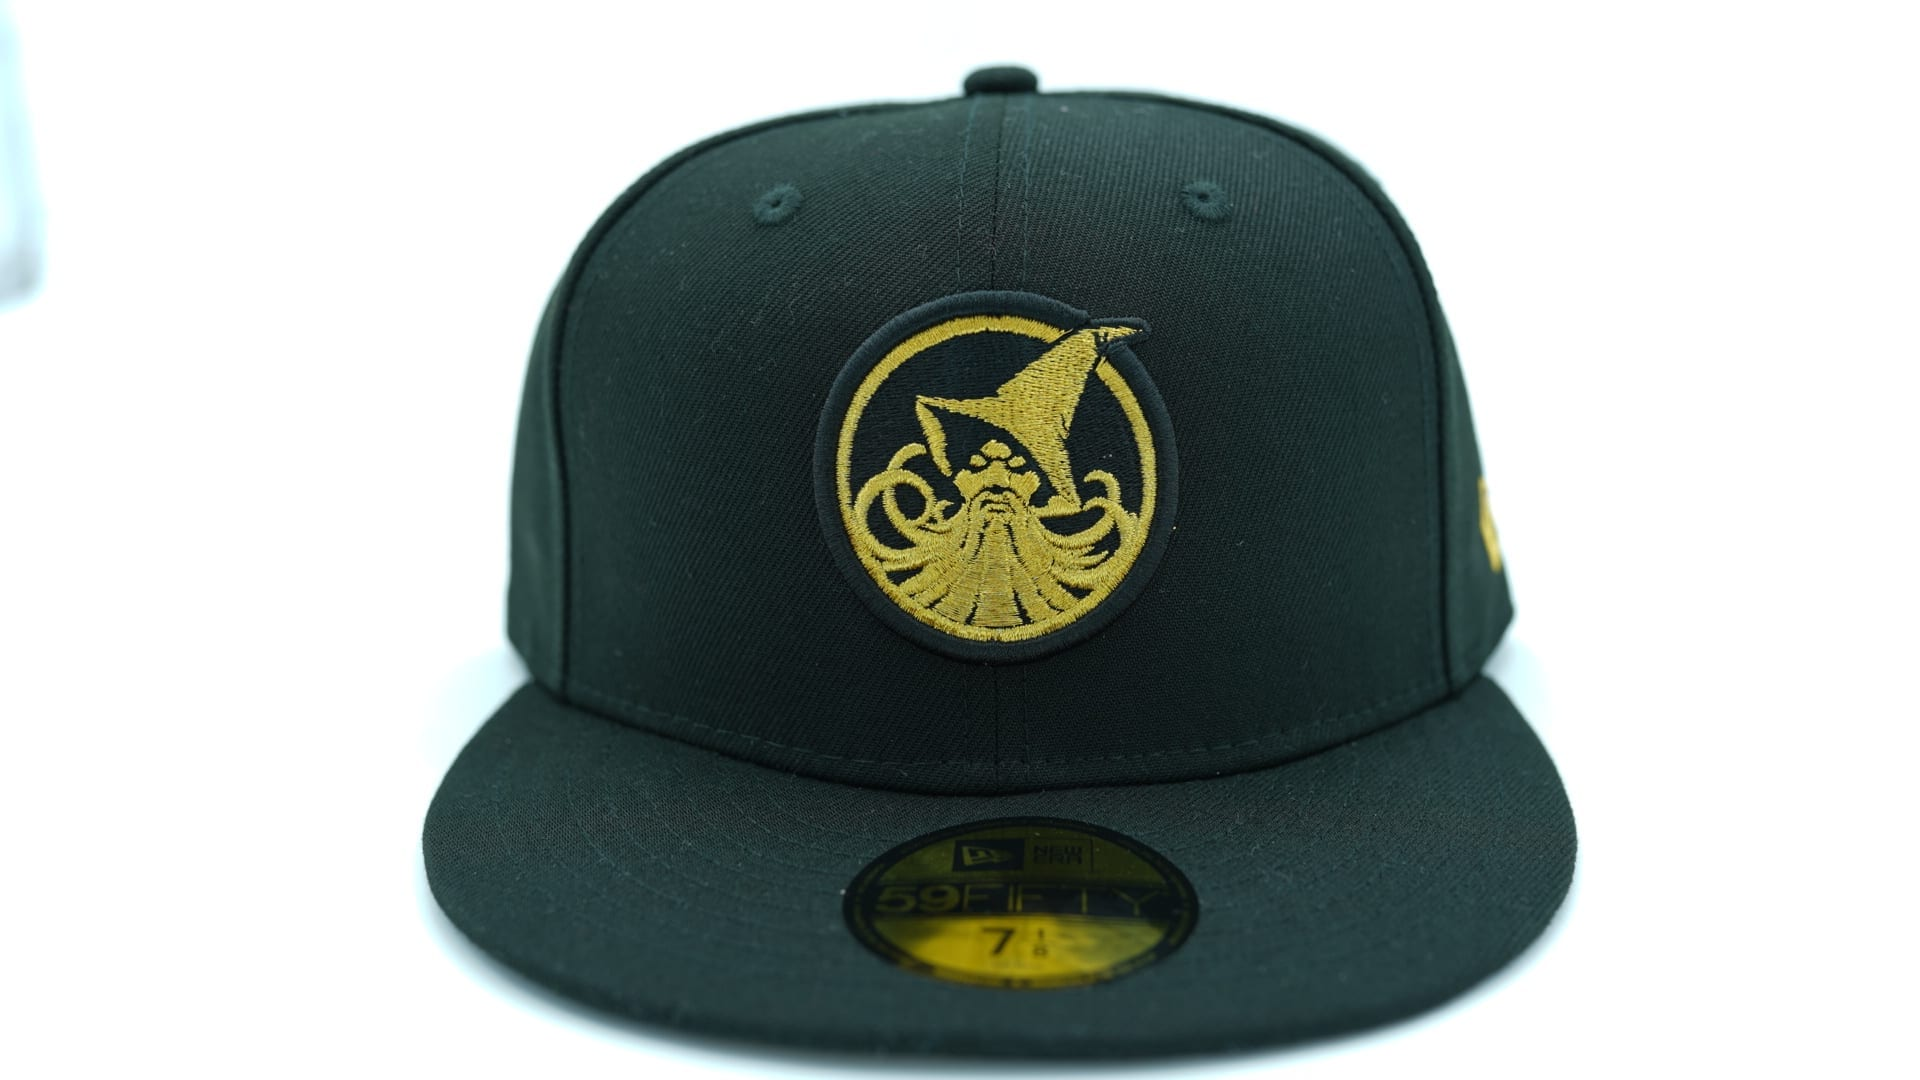 fitted baseball cap hat shaper 421222a00e5